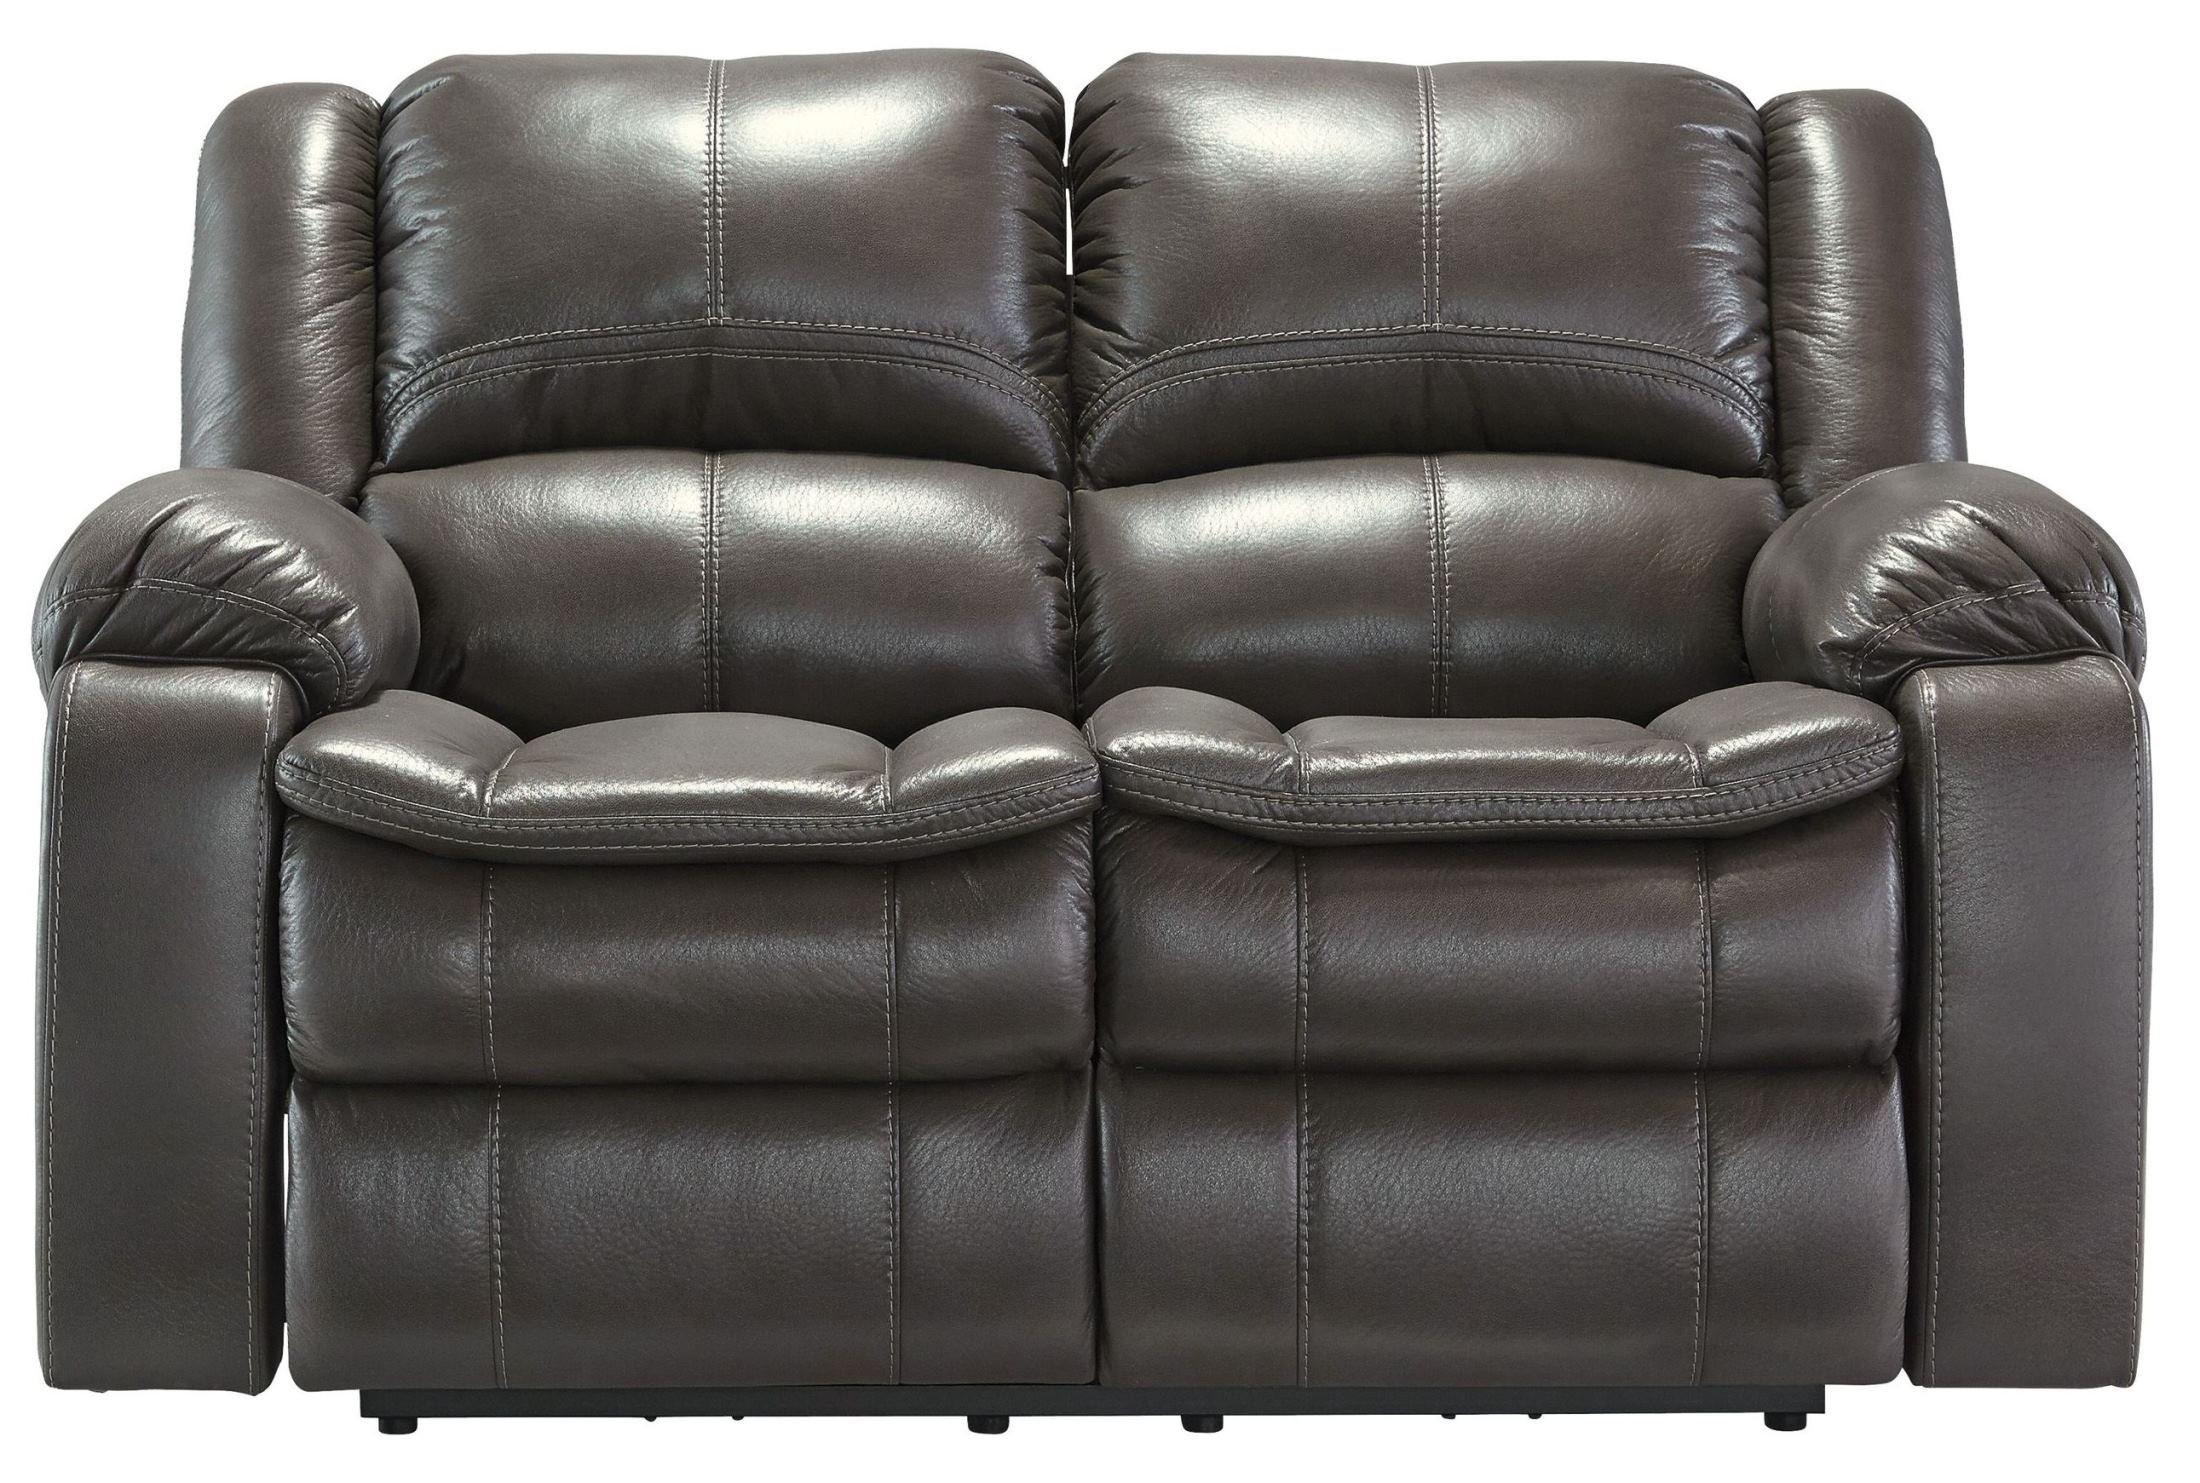 Ashley Furniture Signature Design - Long Knight Loveseat - Manual Recliner - Gray